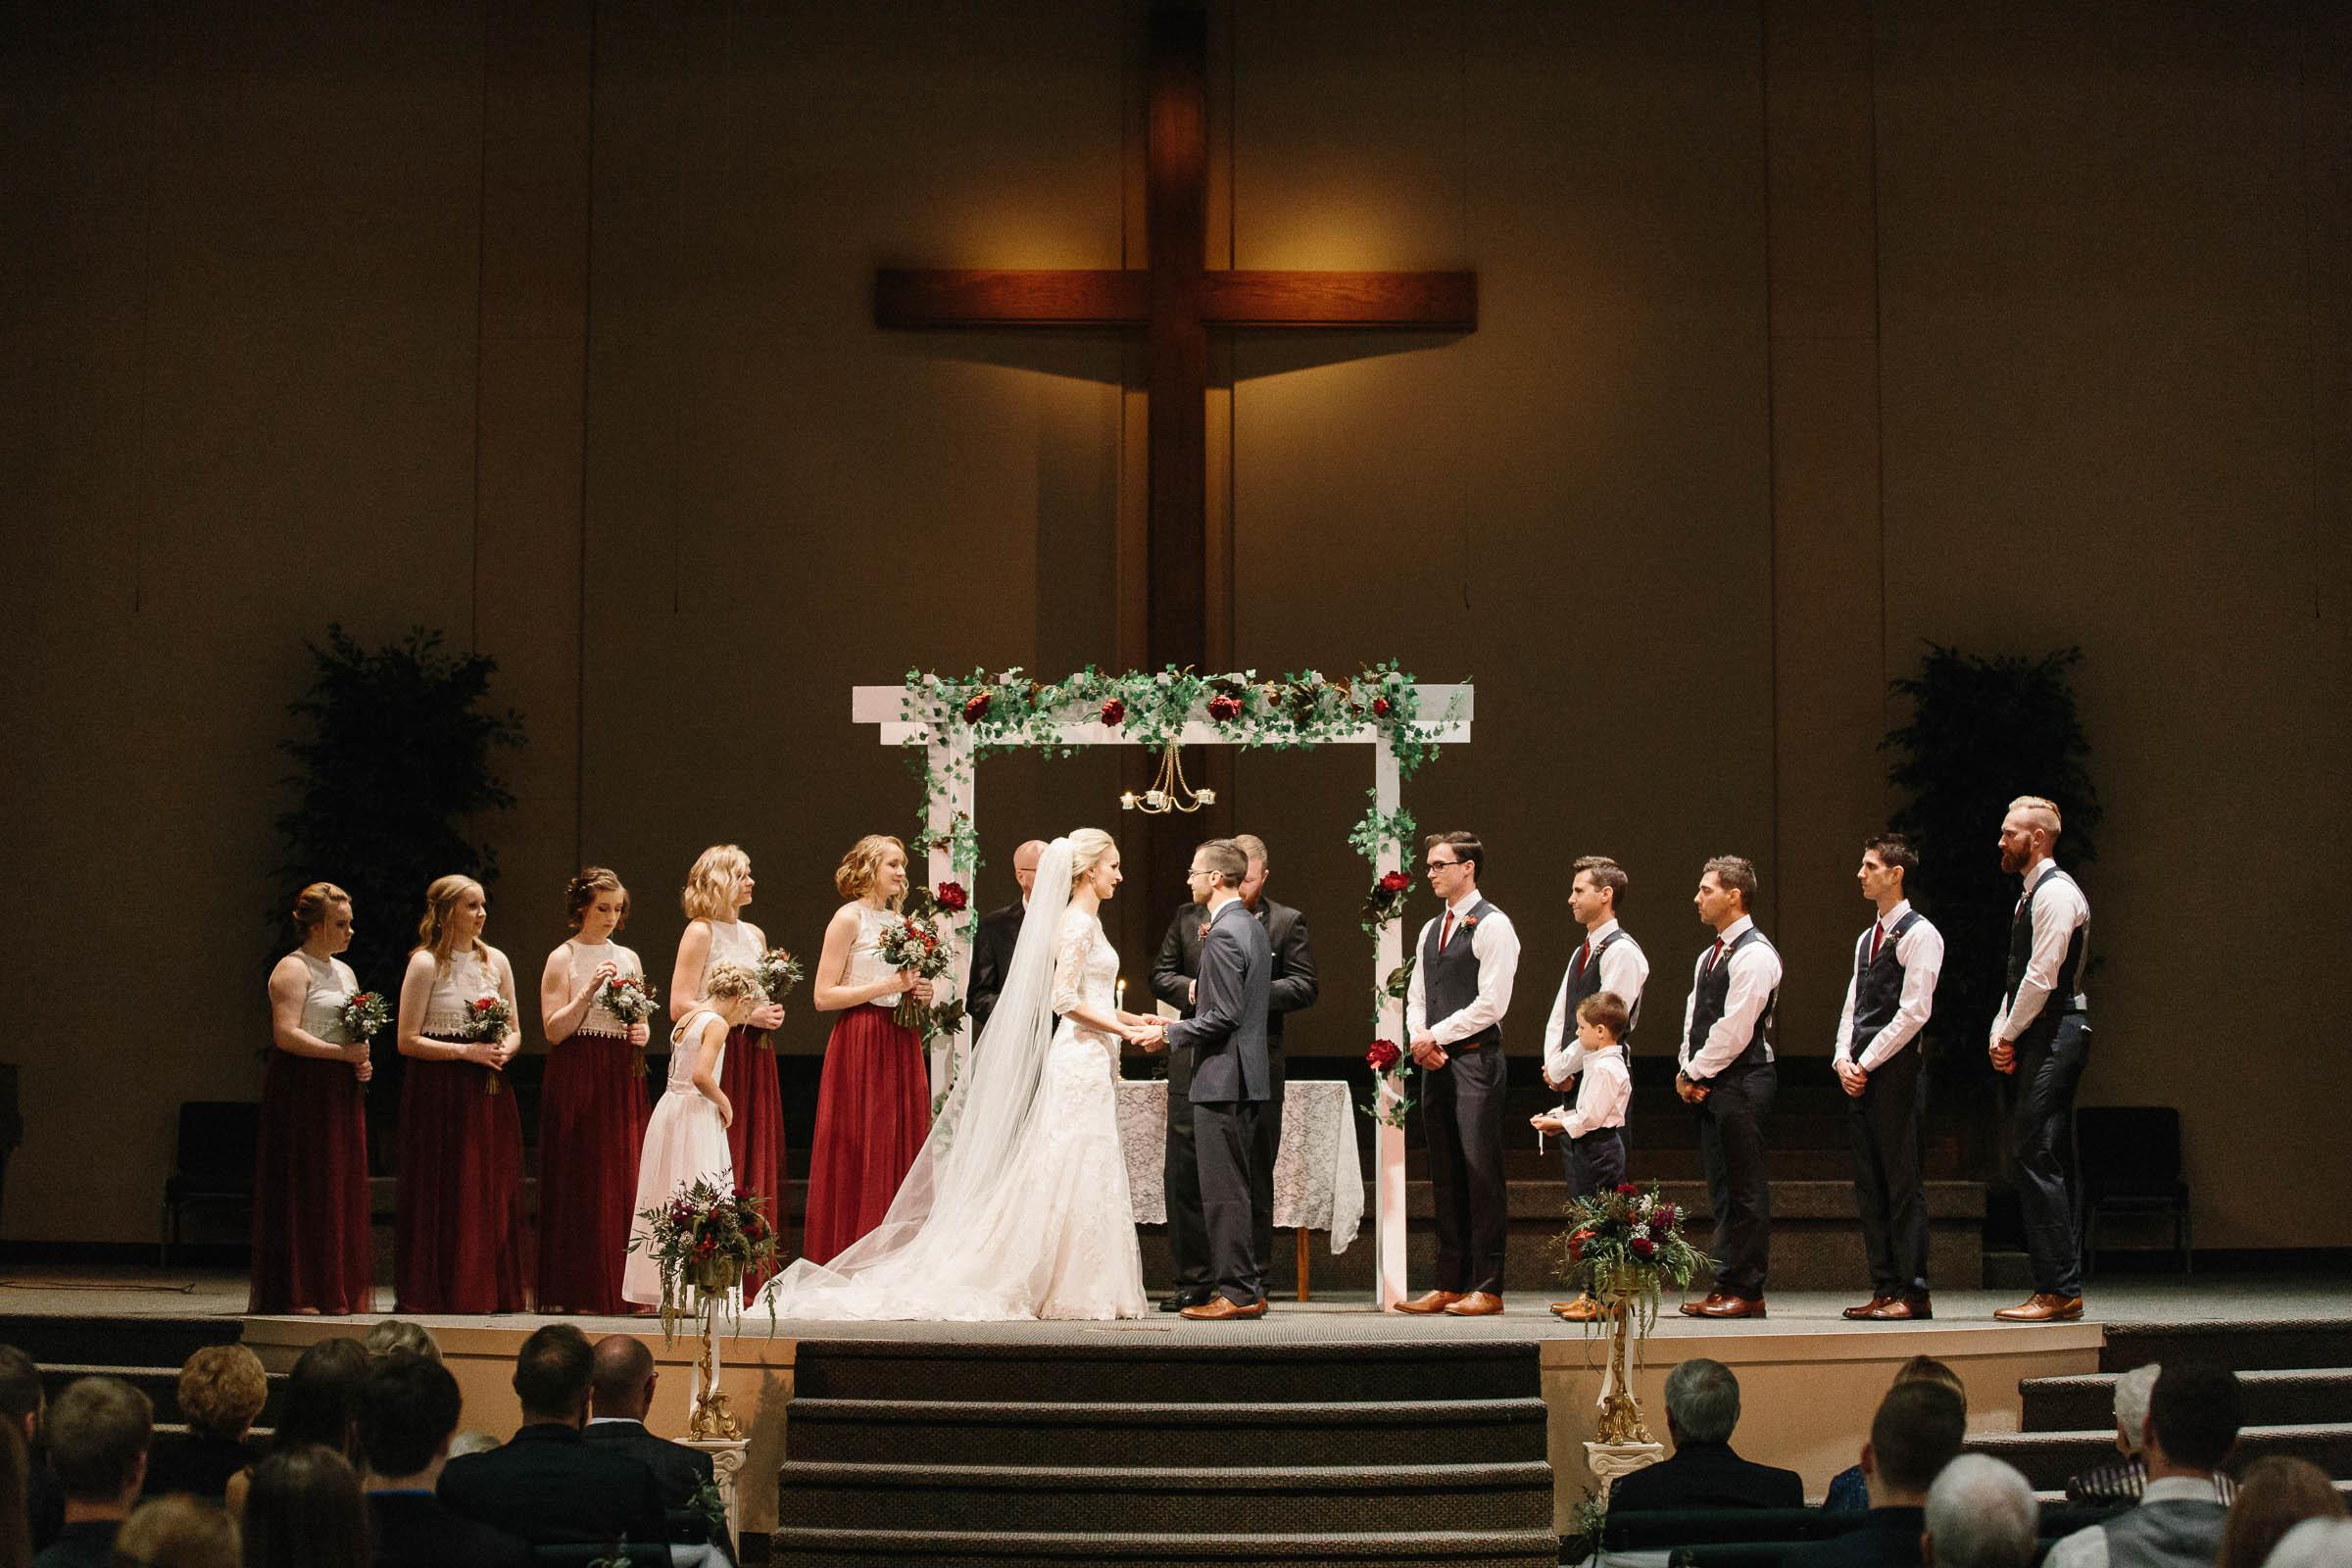 Jenna&Austin_SiouxFalls_Wedding_Photographer_075.jpg